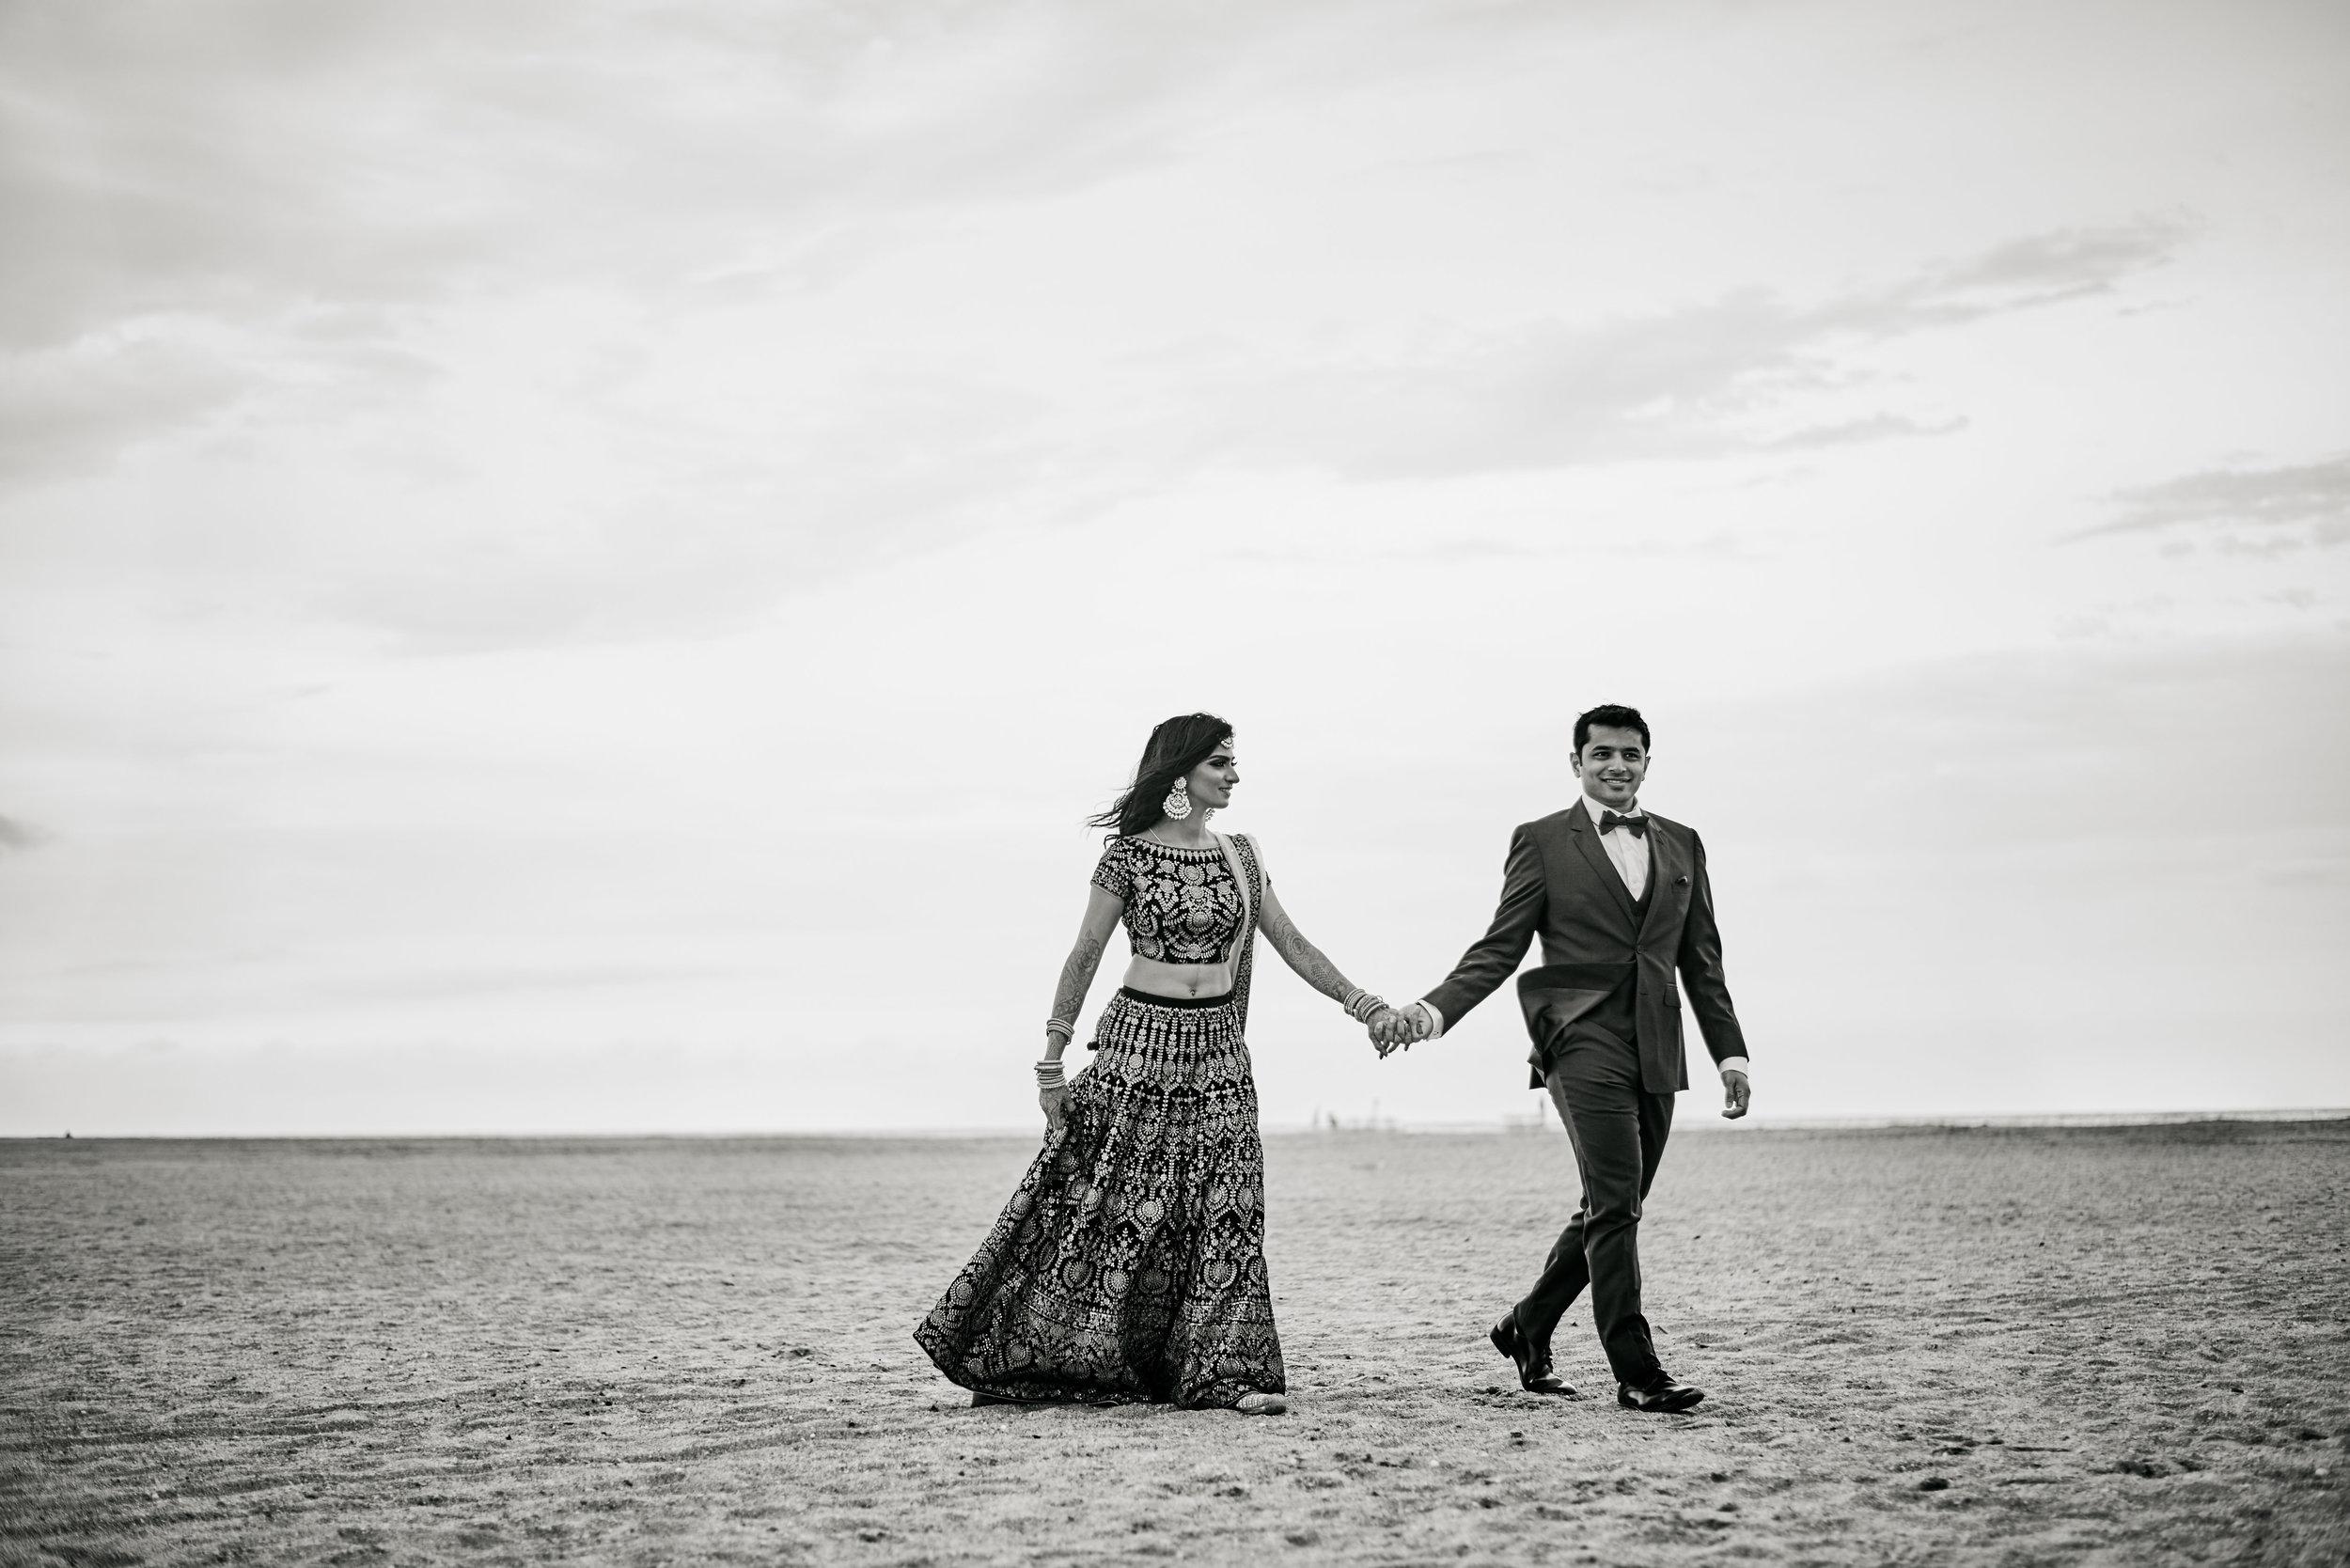 Wild Dunes Wedding Photos by Vitor Lindo _ 527.jpg